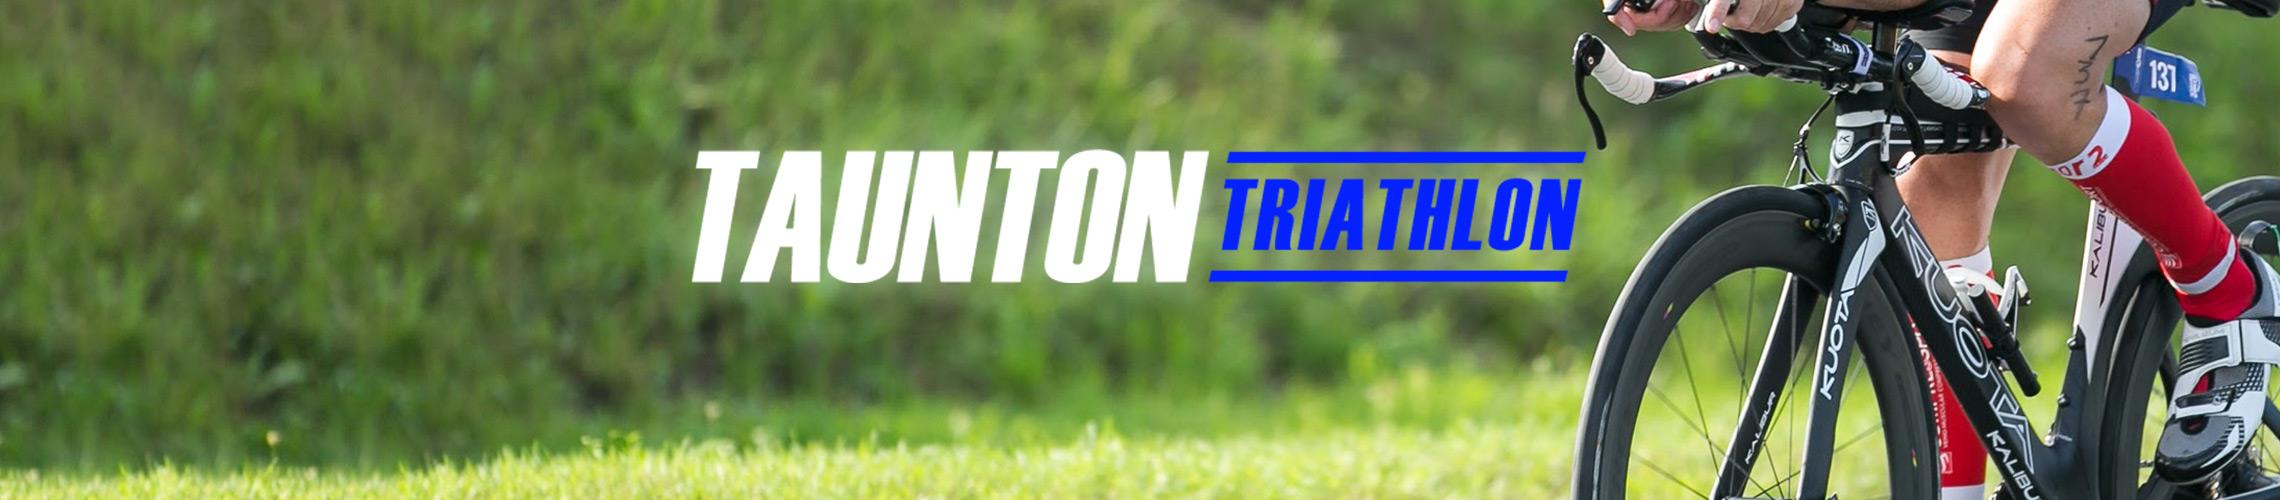 Taunton Triathlon